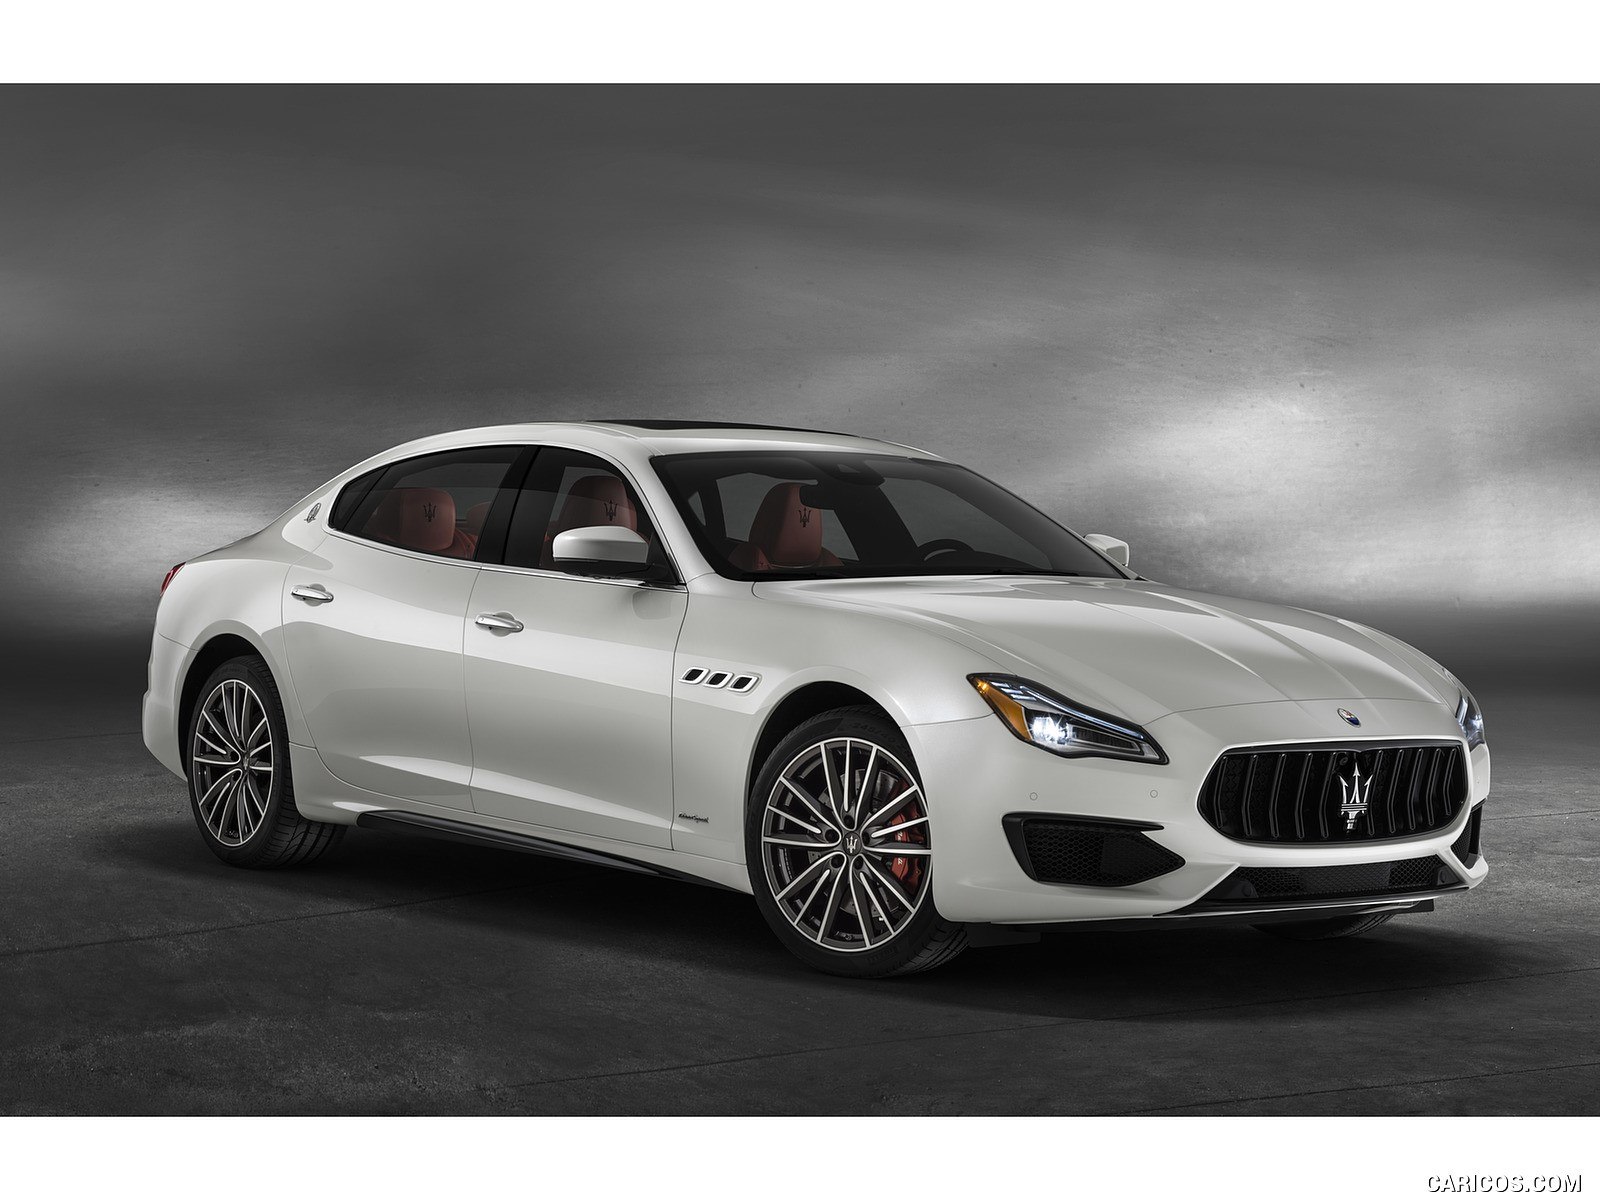 Maserati Quattroporte 2019 duvar kağıtları